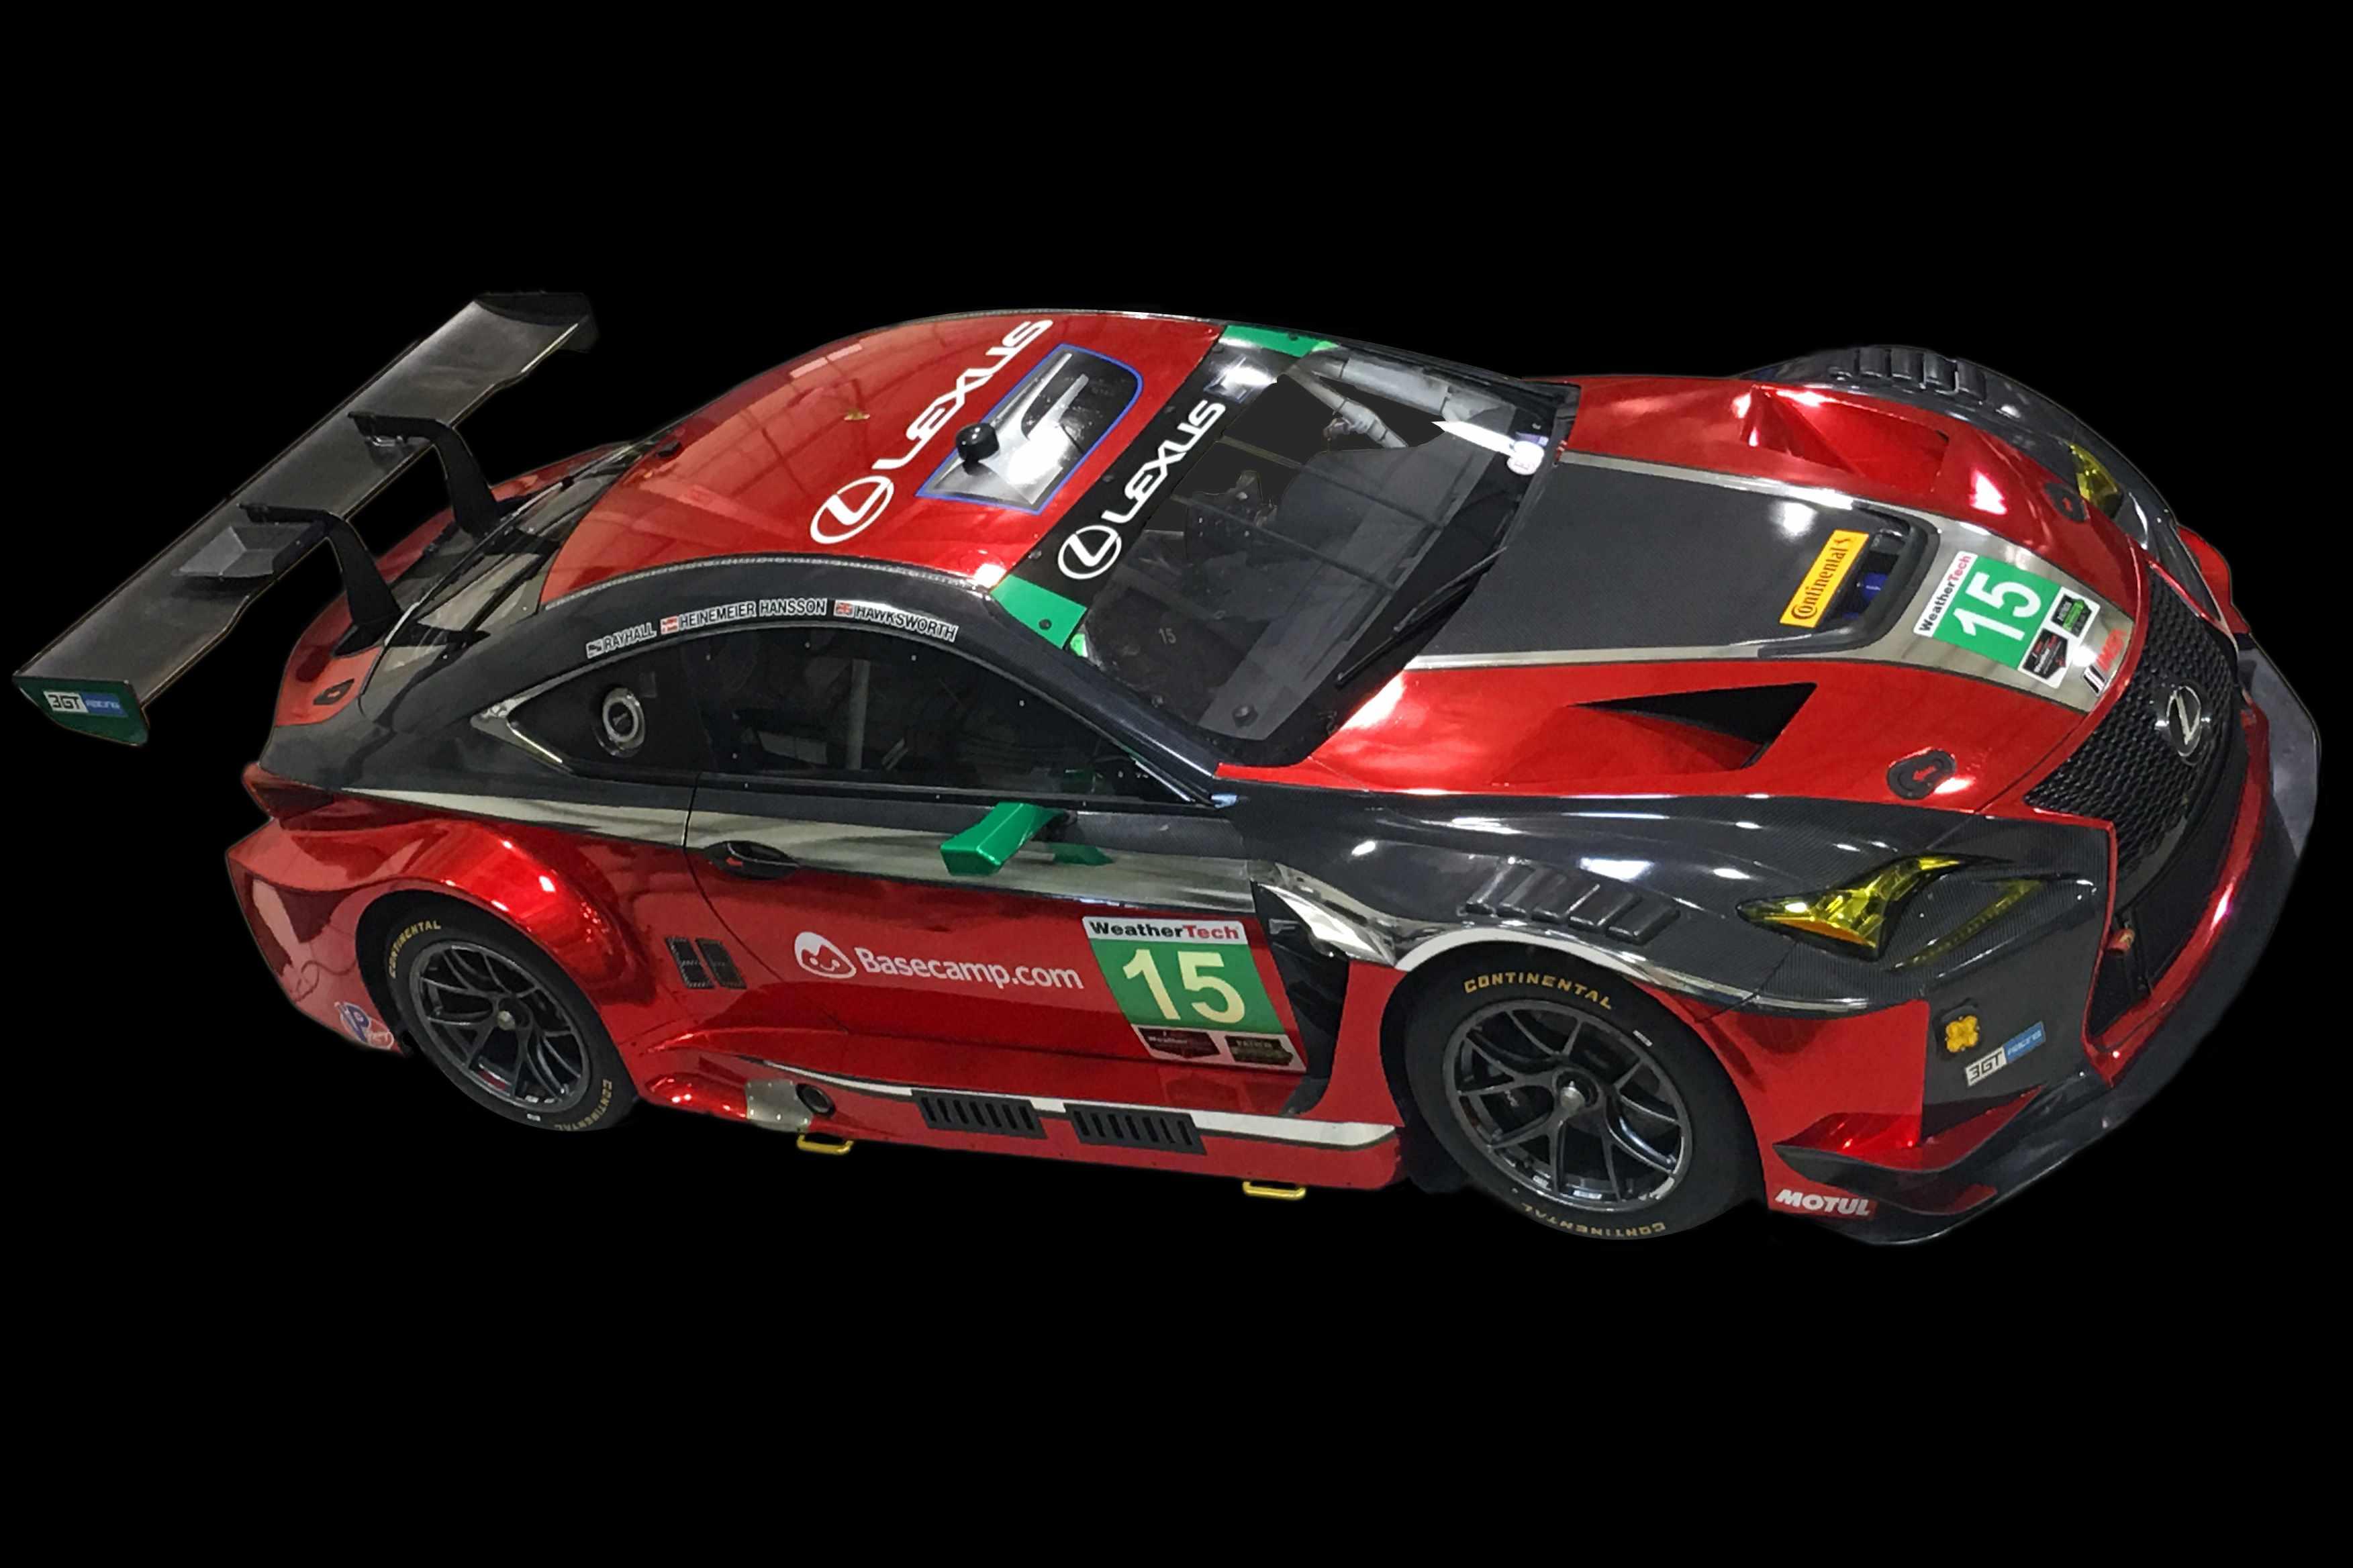 15 red Lexus RC F GT3